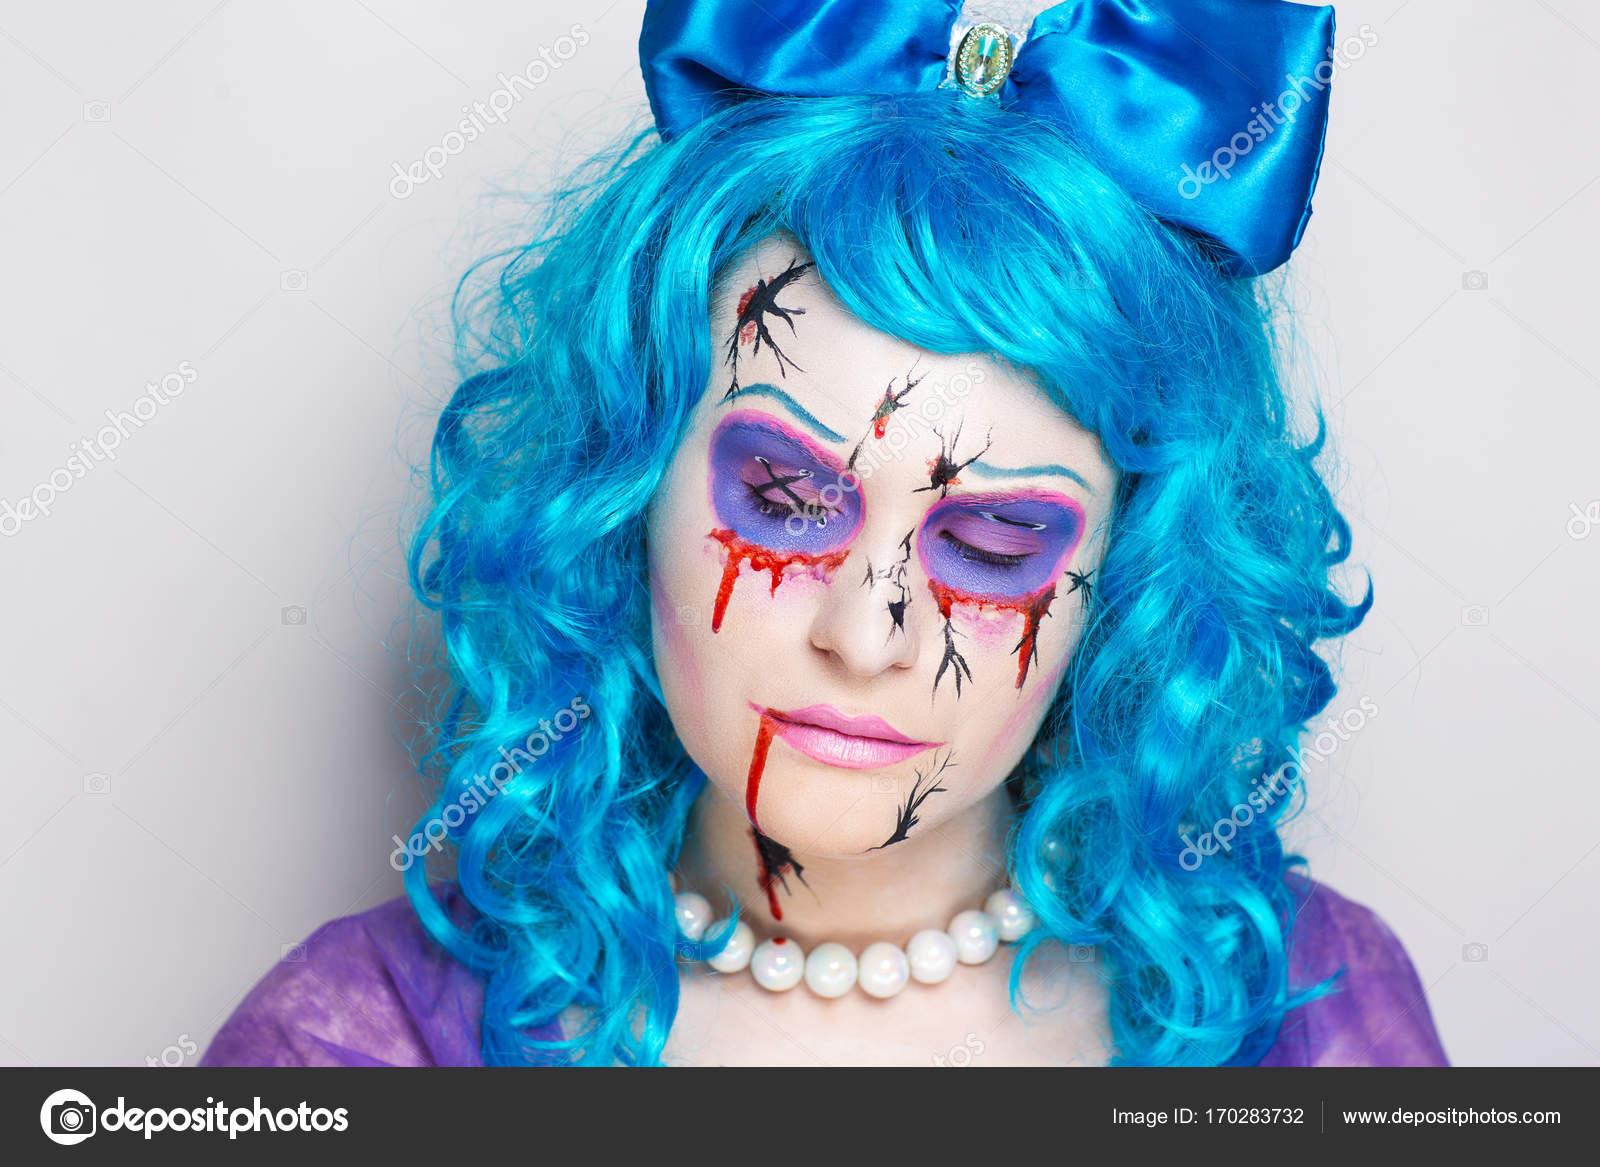 File Cyndi Blue Hair 2000 Jpg: Stock Photo © OlgaOsa #170283732